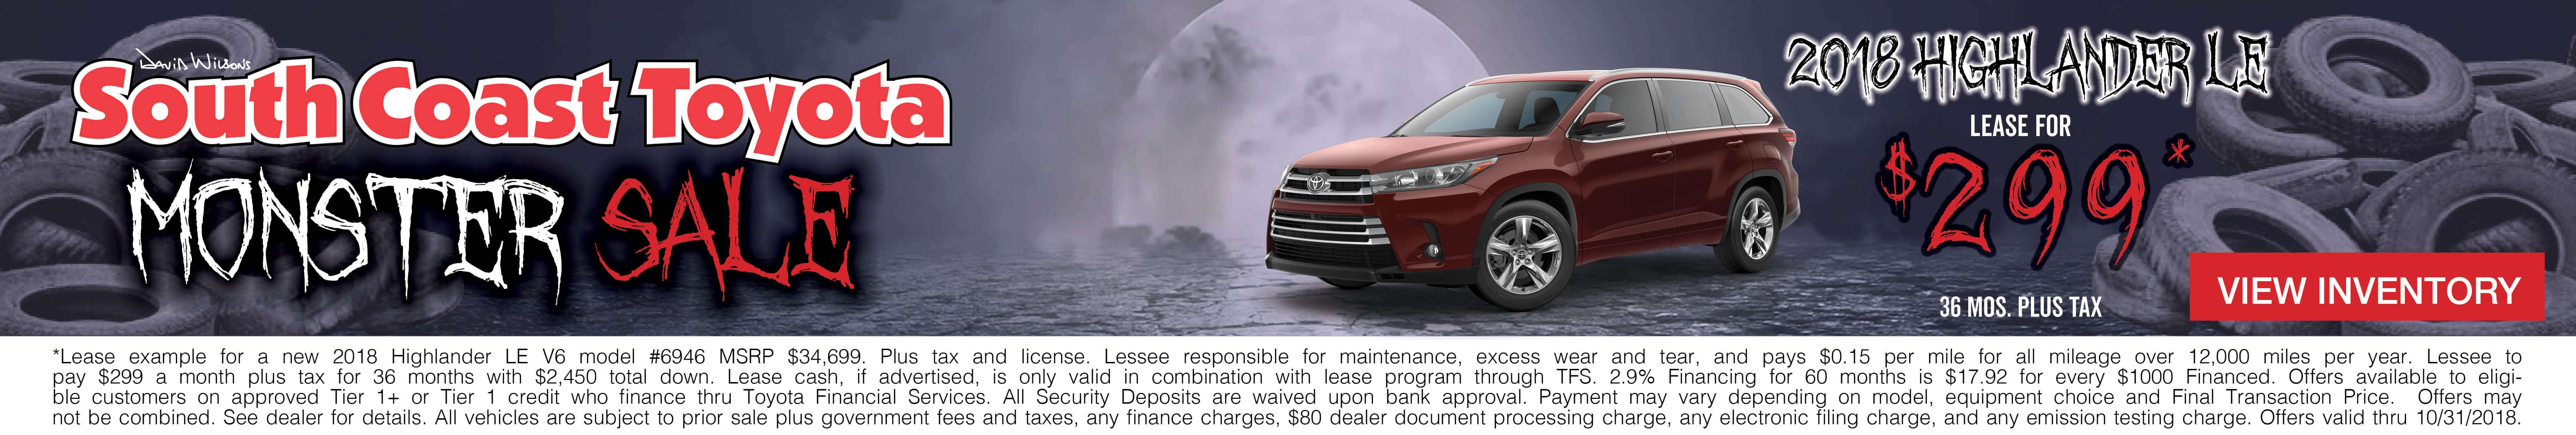 Toyota Highlander $299 Lease